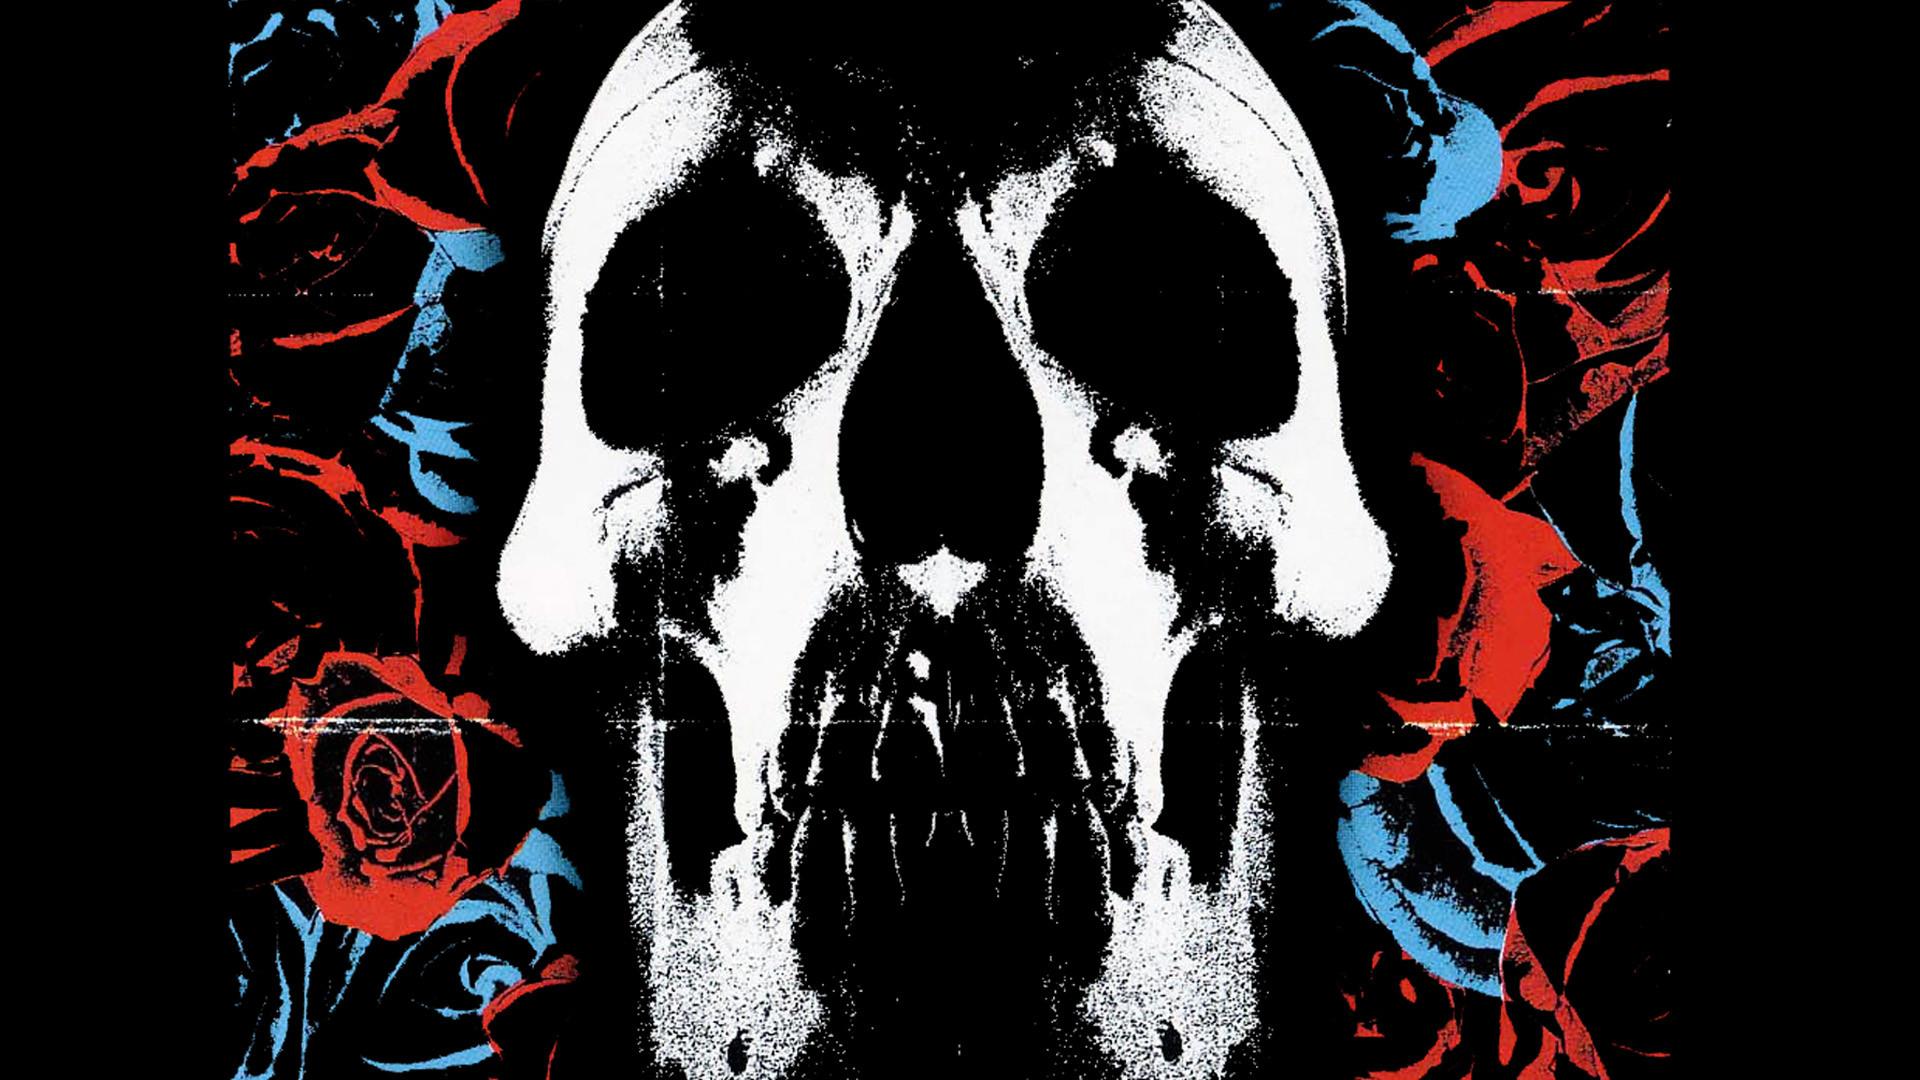 Music – Deftones Wallpaper